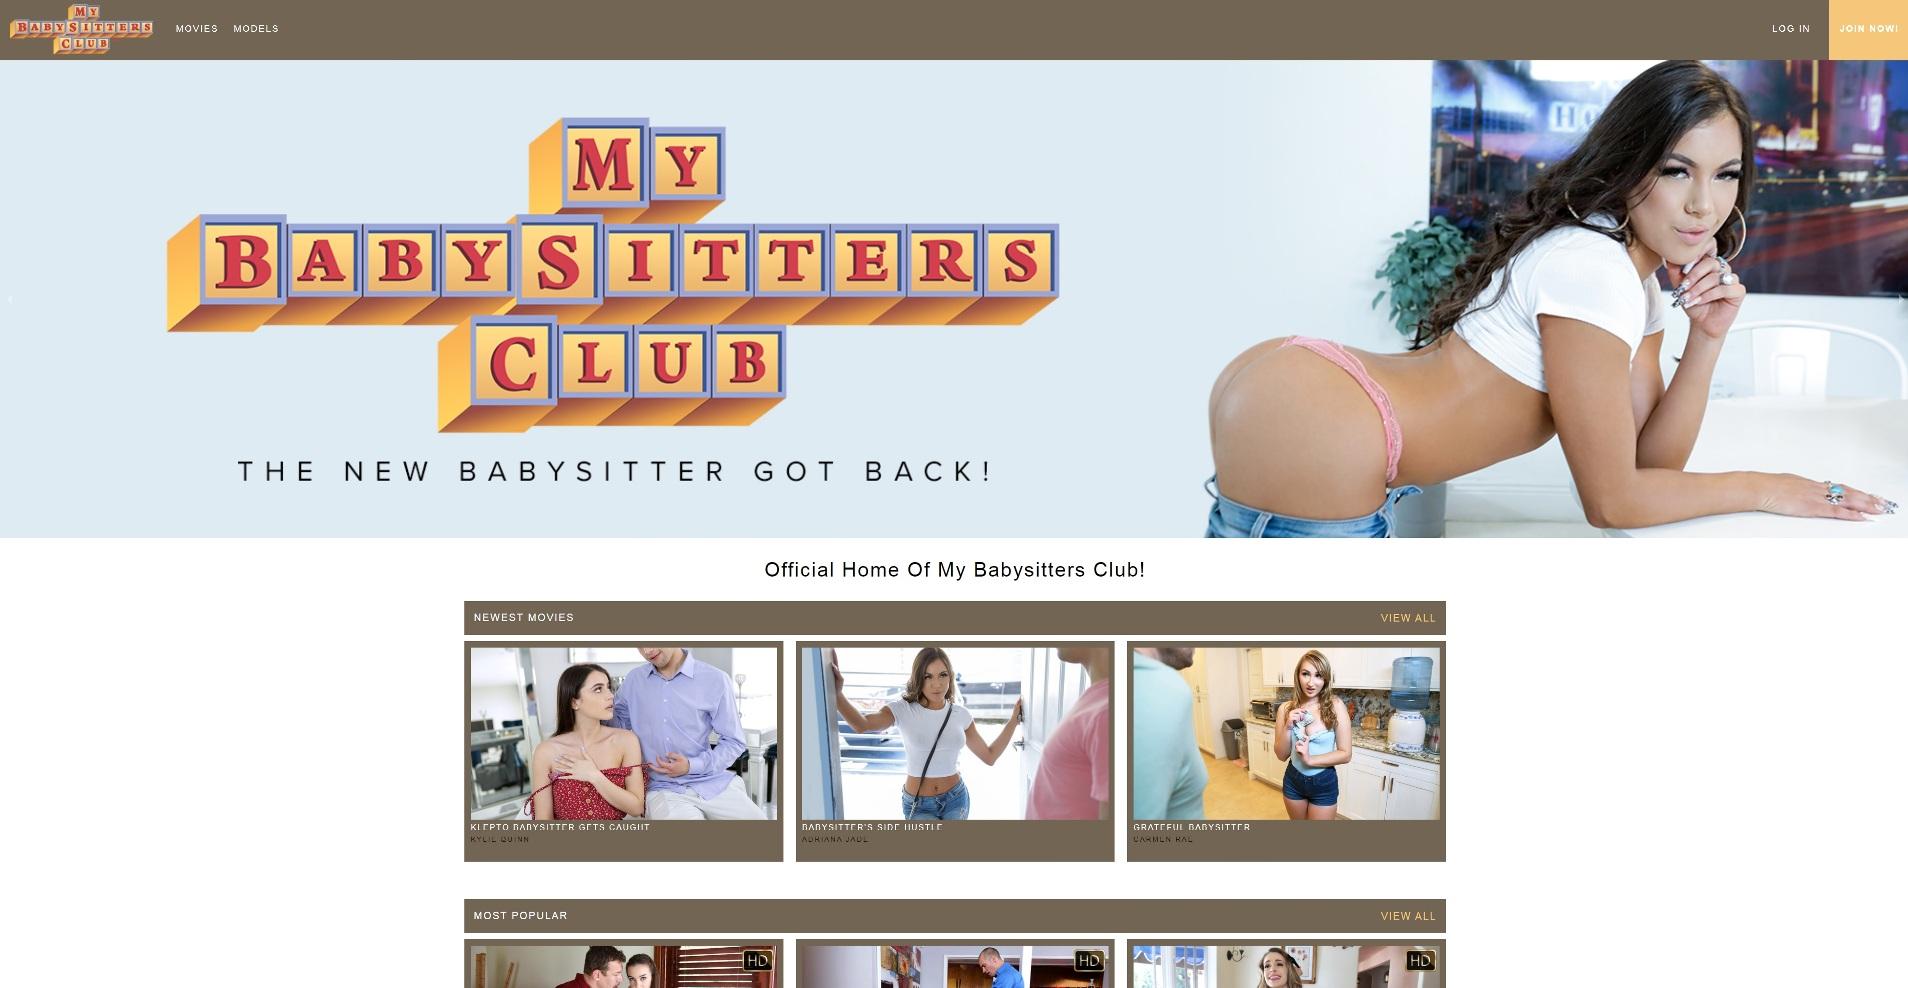 111 MyBabySittersClub M - MyBabySittersClub.com - Full SiteRip!